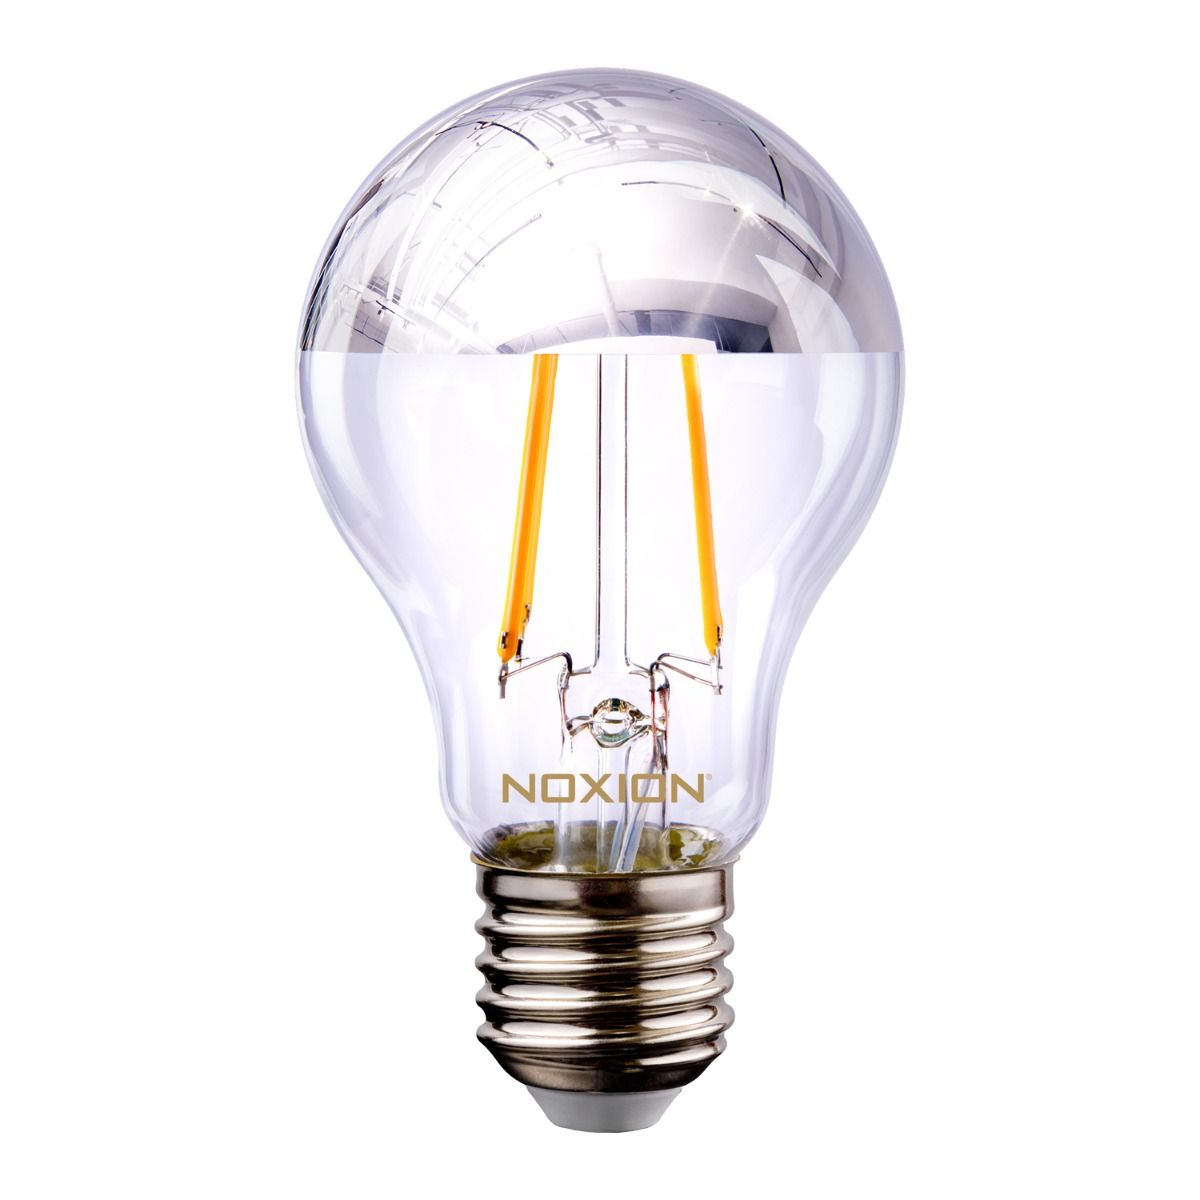 Noxion Lucent Gloeilamp LED Bulb Zilver Kopspiegel A60 E27 220-240V 7W 680LM CRI80 2700K ND (60W eqv.)